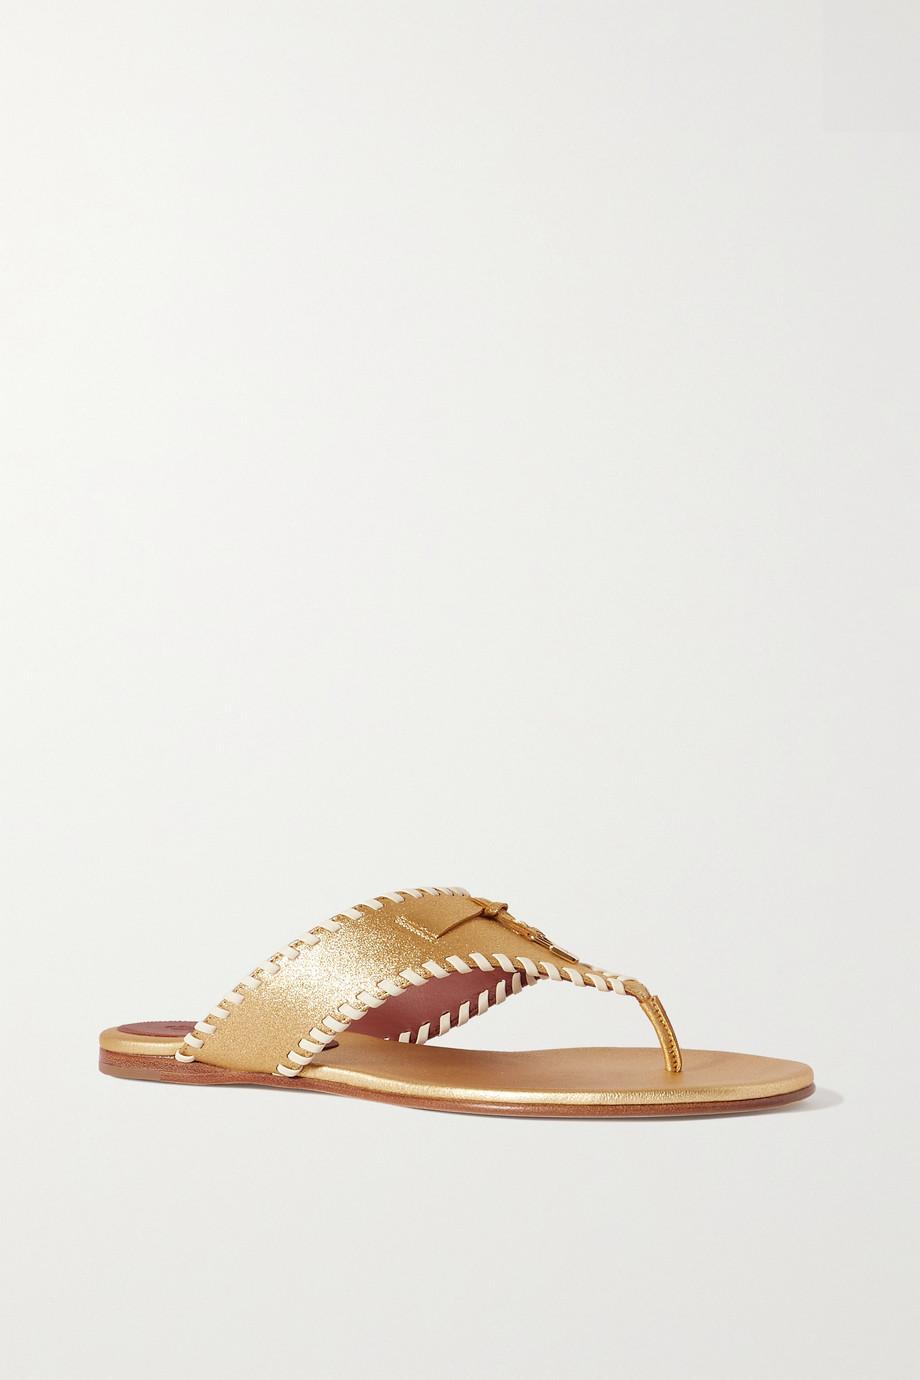 Loro Piana Jovis whipstitched metallic leather flip flops